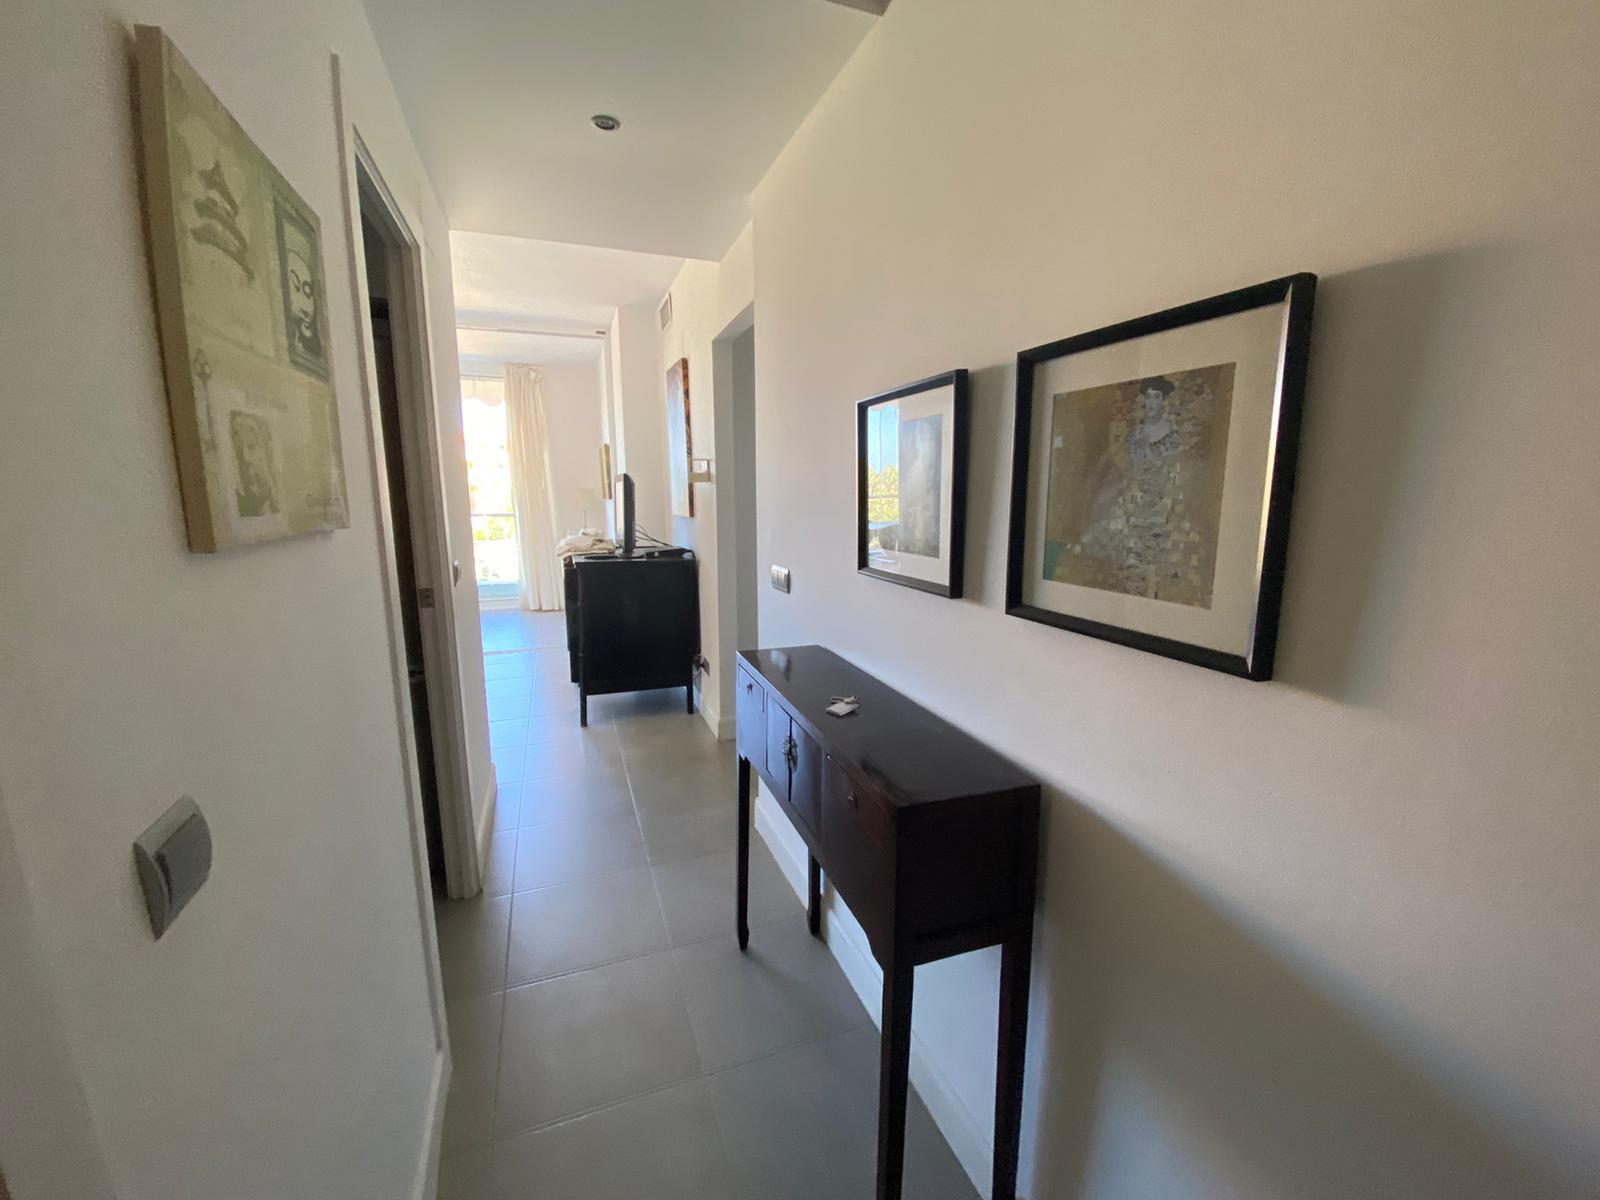 Imagen 15 del Apartamento en El Espigón, 1ª Planta nº4 Poniente (3d+2b), Punta del Moral (HUELVA), Paseo de la Cruz nº22